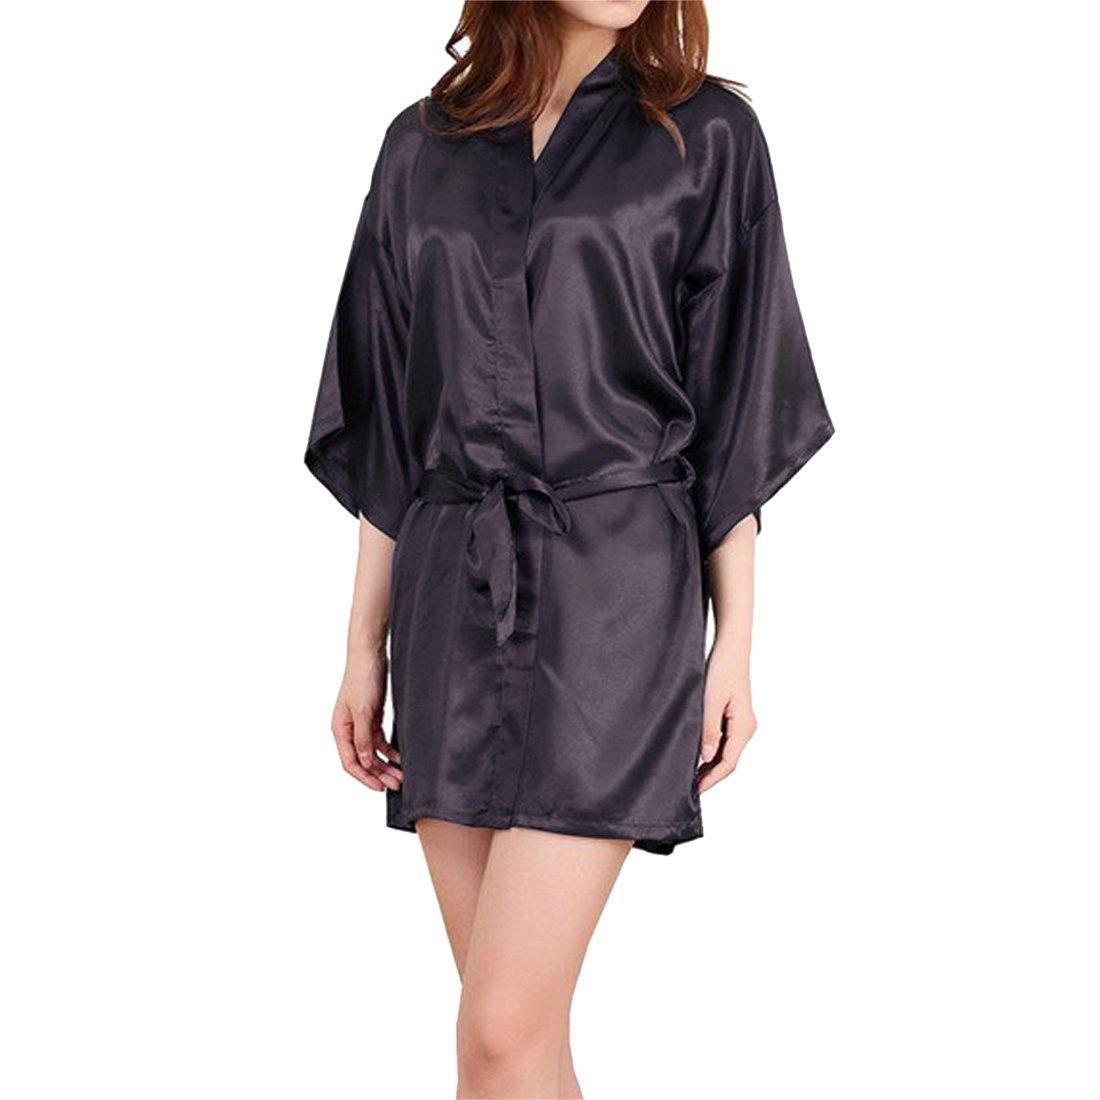 Sidiou Group Women Dressing Nightgown Kimono Robe Lace Nightwear Sexy Sleepwear